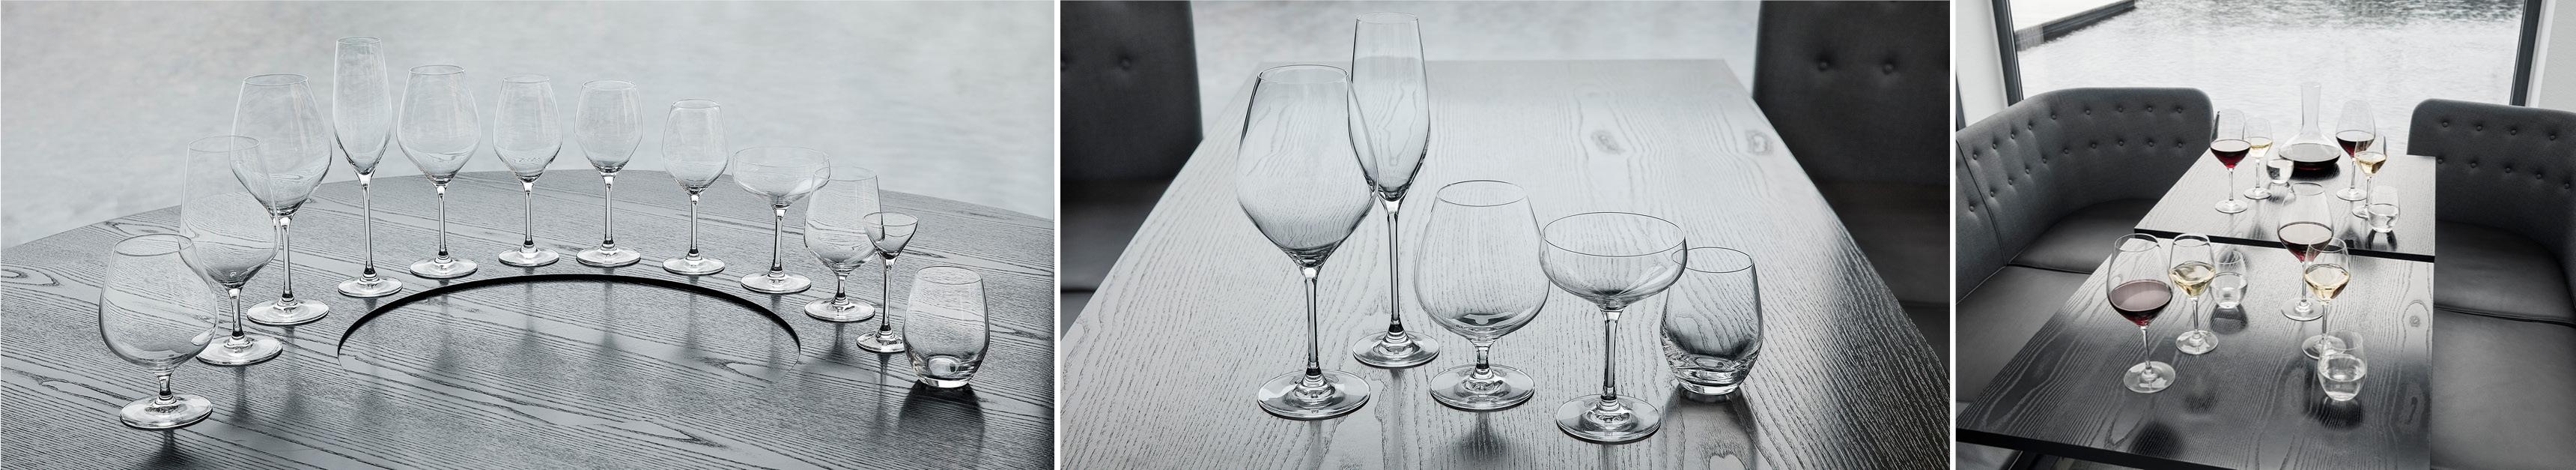 Holmegaard-Cabernet-vinglass-d.jpg